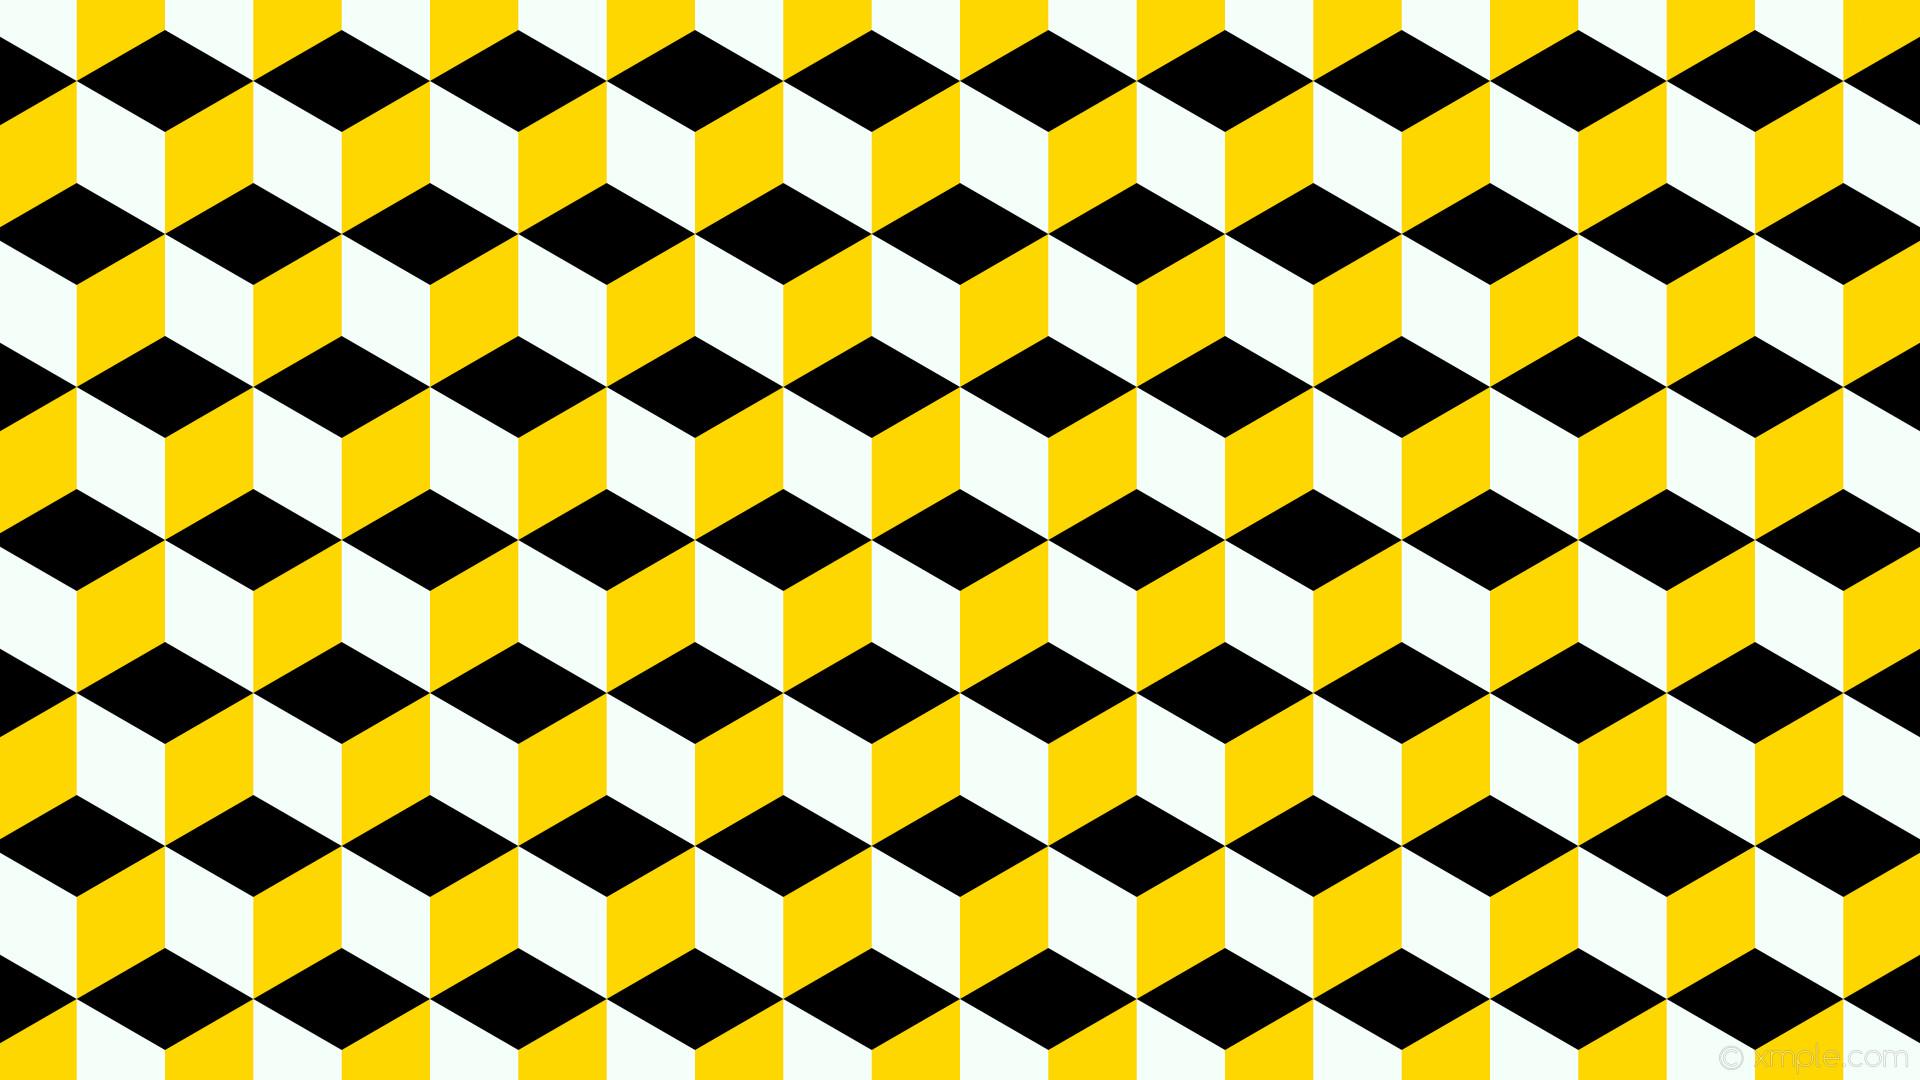 wallpaper yellow 3d cubes white black mint cream gold #000000 #f5fffa  #ffd700 0